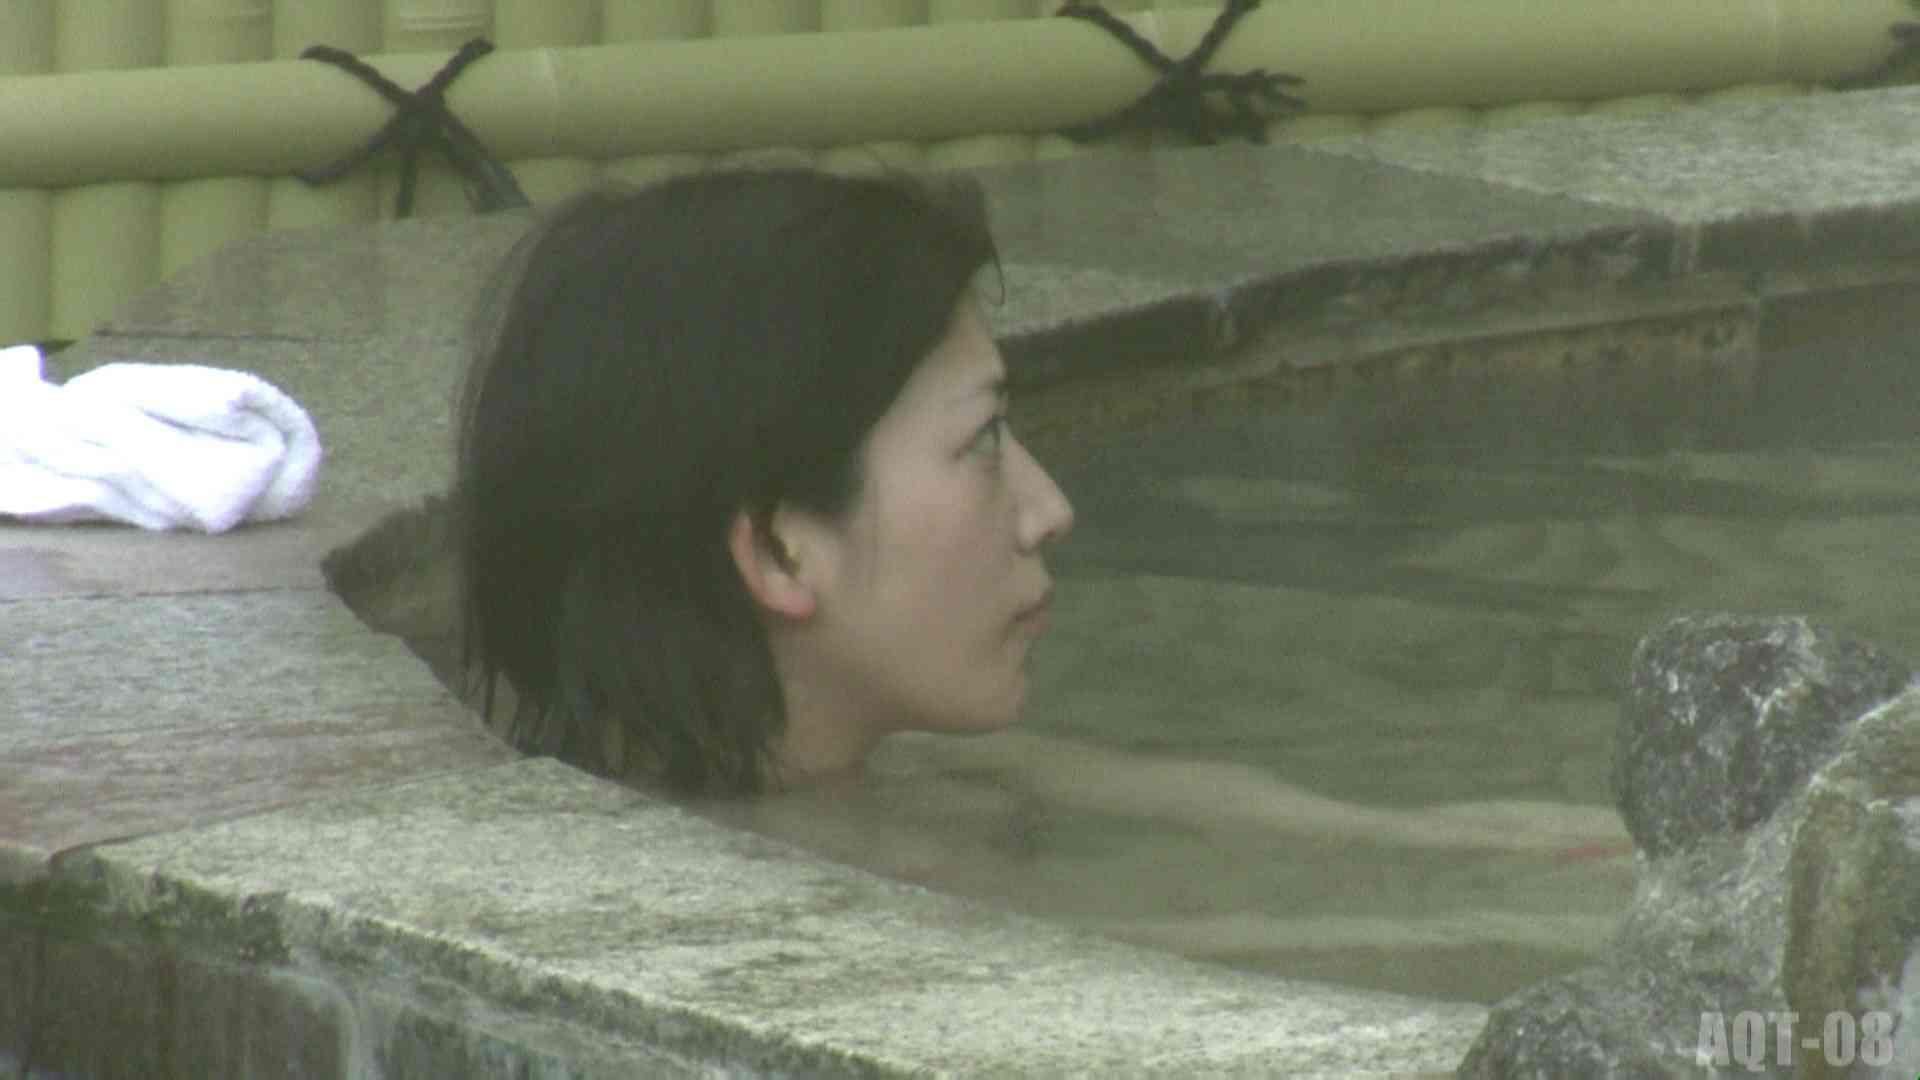 Aquaな露天風呂Vol.776 盗撮 エロ無料画像 108画像 50